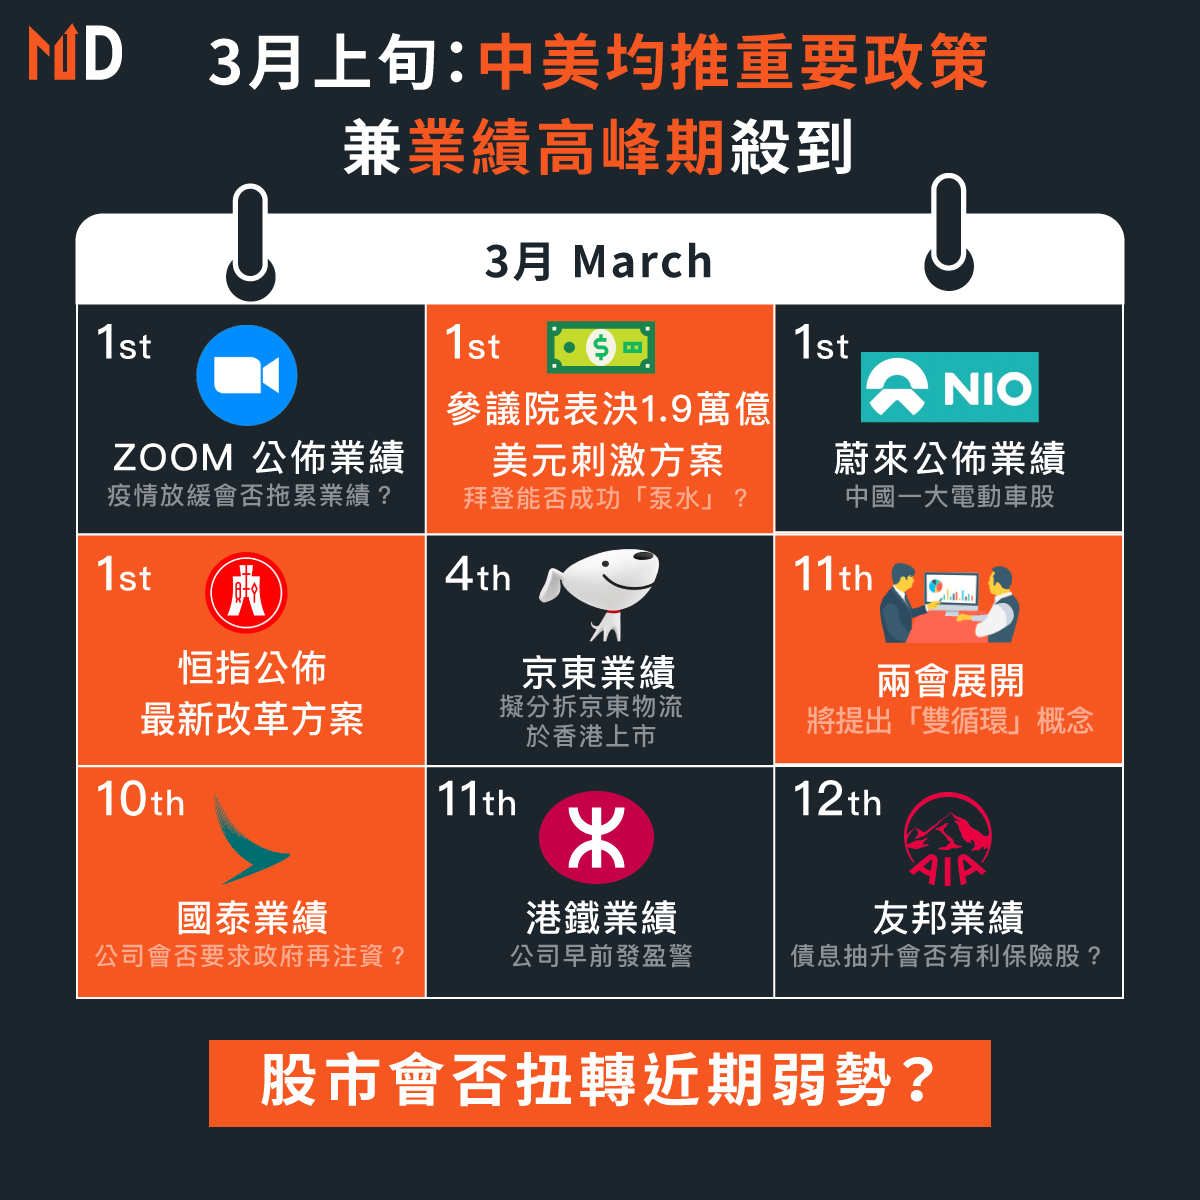 【#MD財經月曆】3月上旬:中美均推重要政策,兼業績高峰期殺到